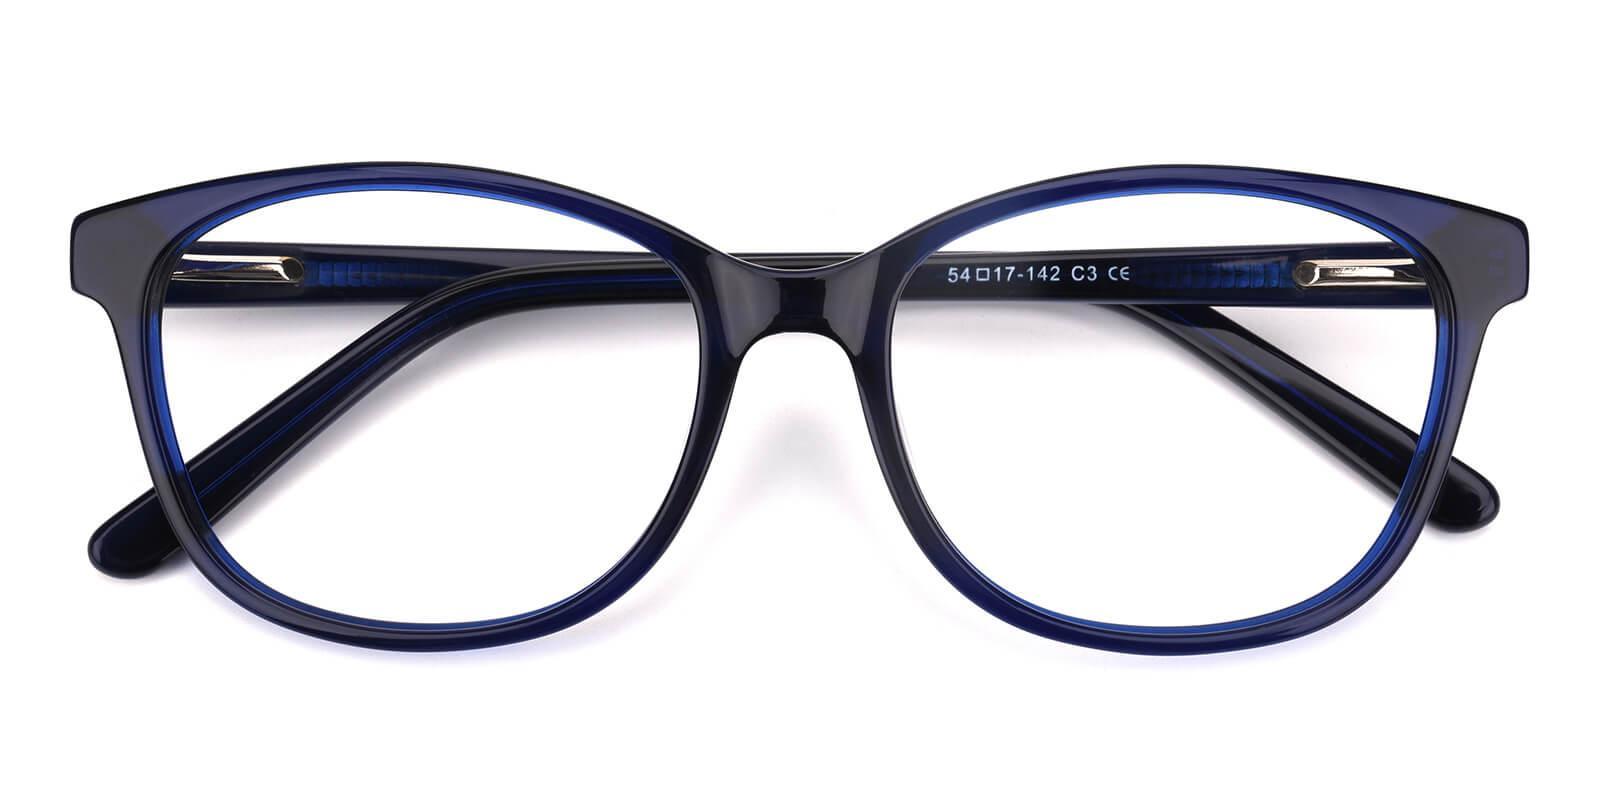 Bolivia-Blue-Cat-Acetate-Eyeglasses-detail